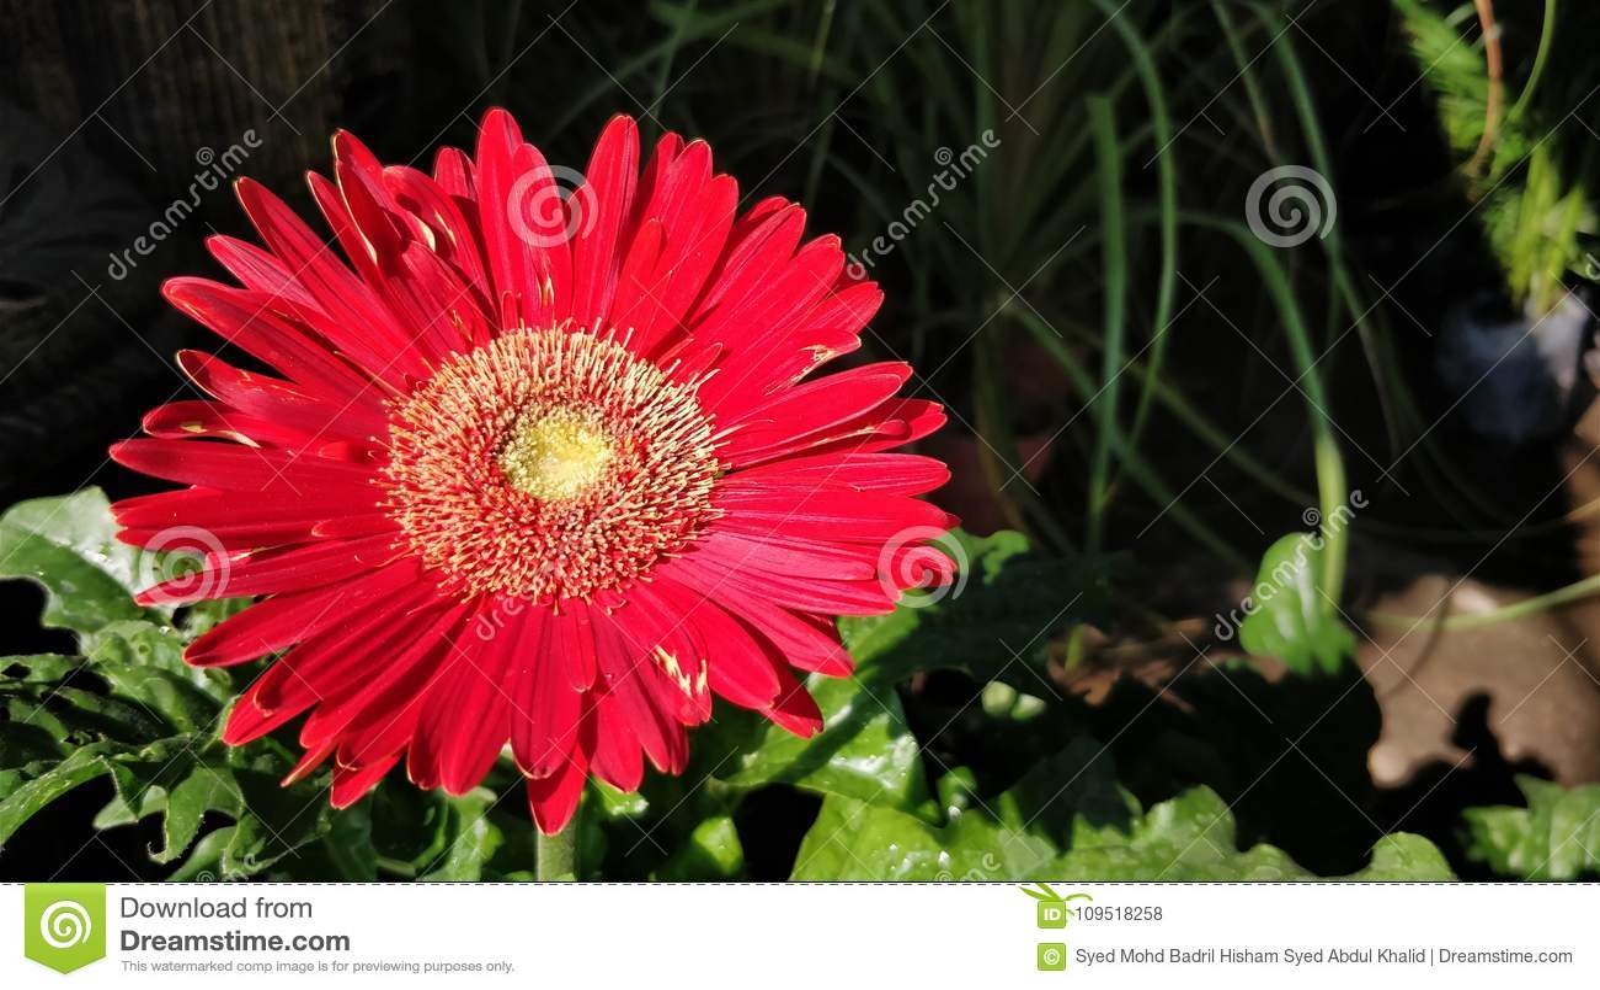 Red Gerbera Flower Stock Photo Image Of Bright Lush 109518258